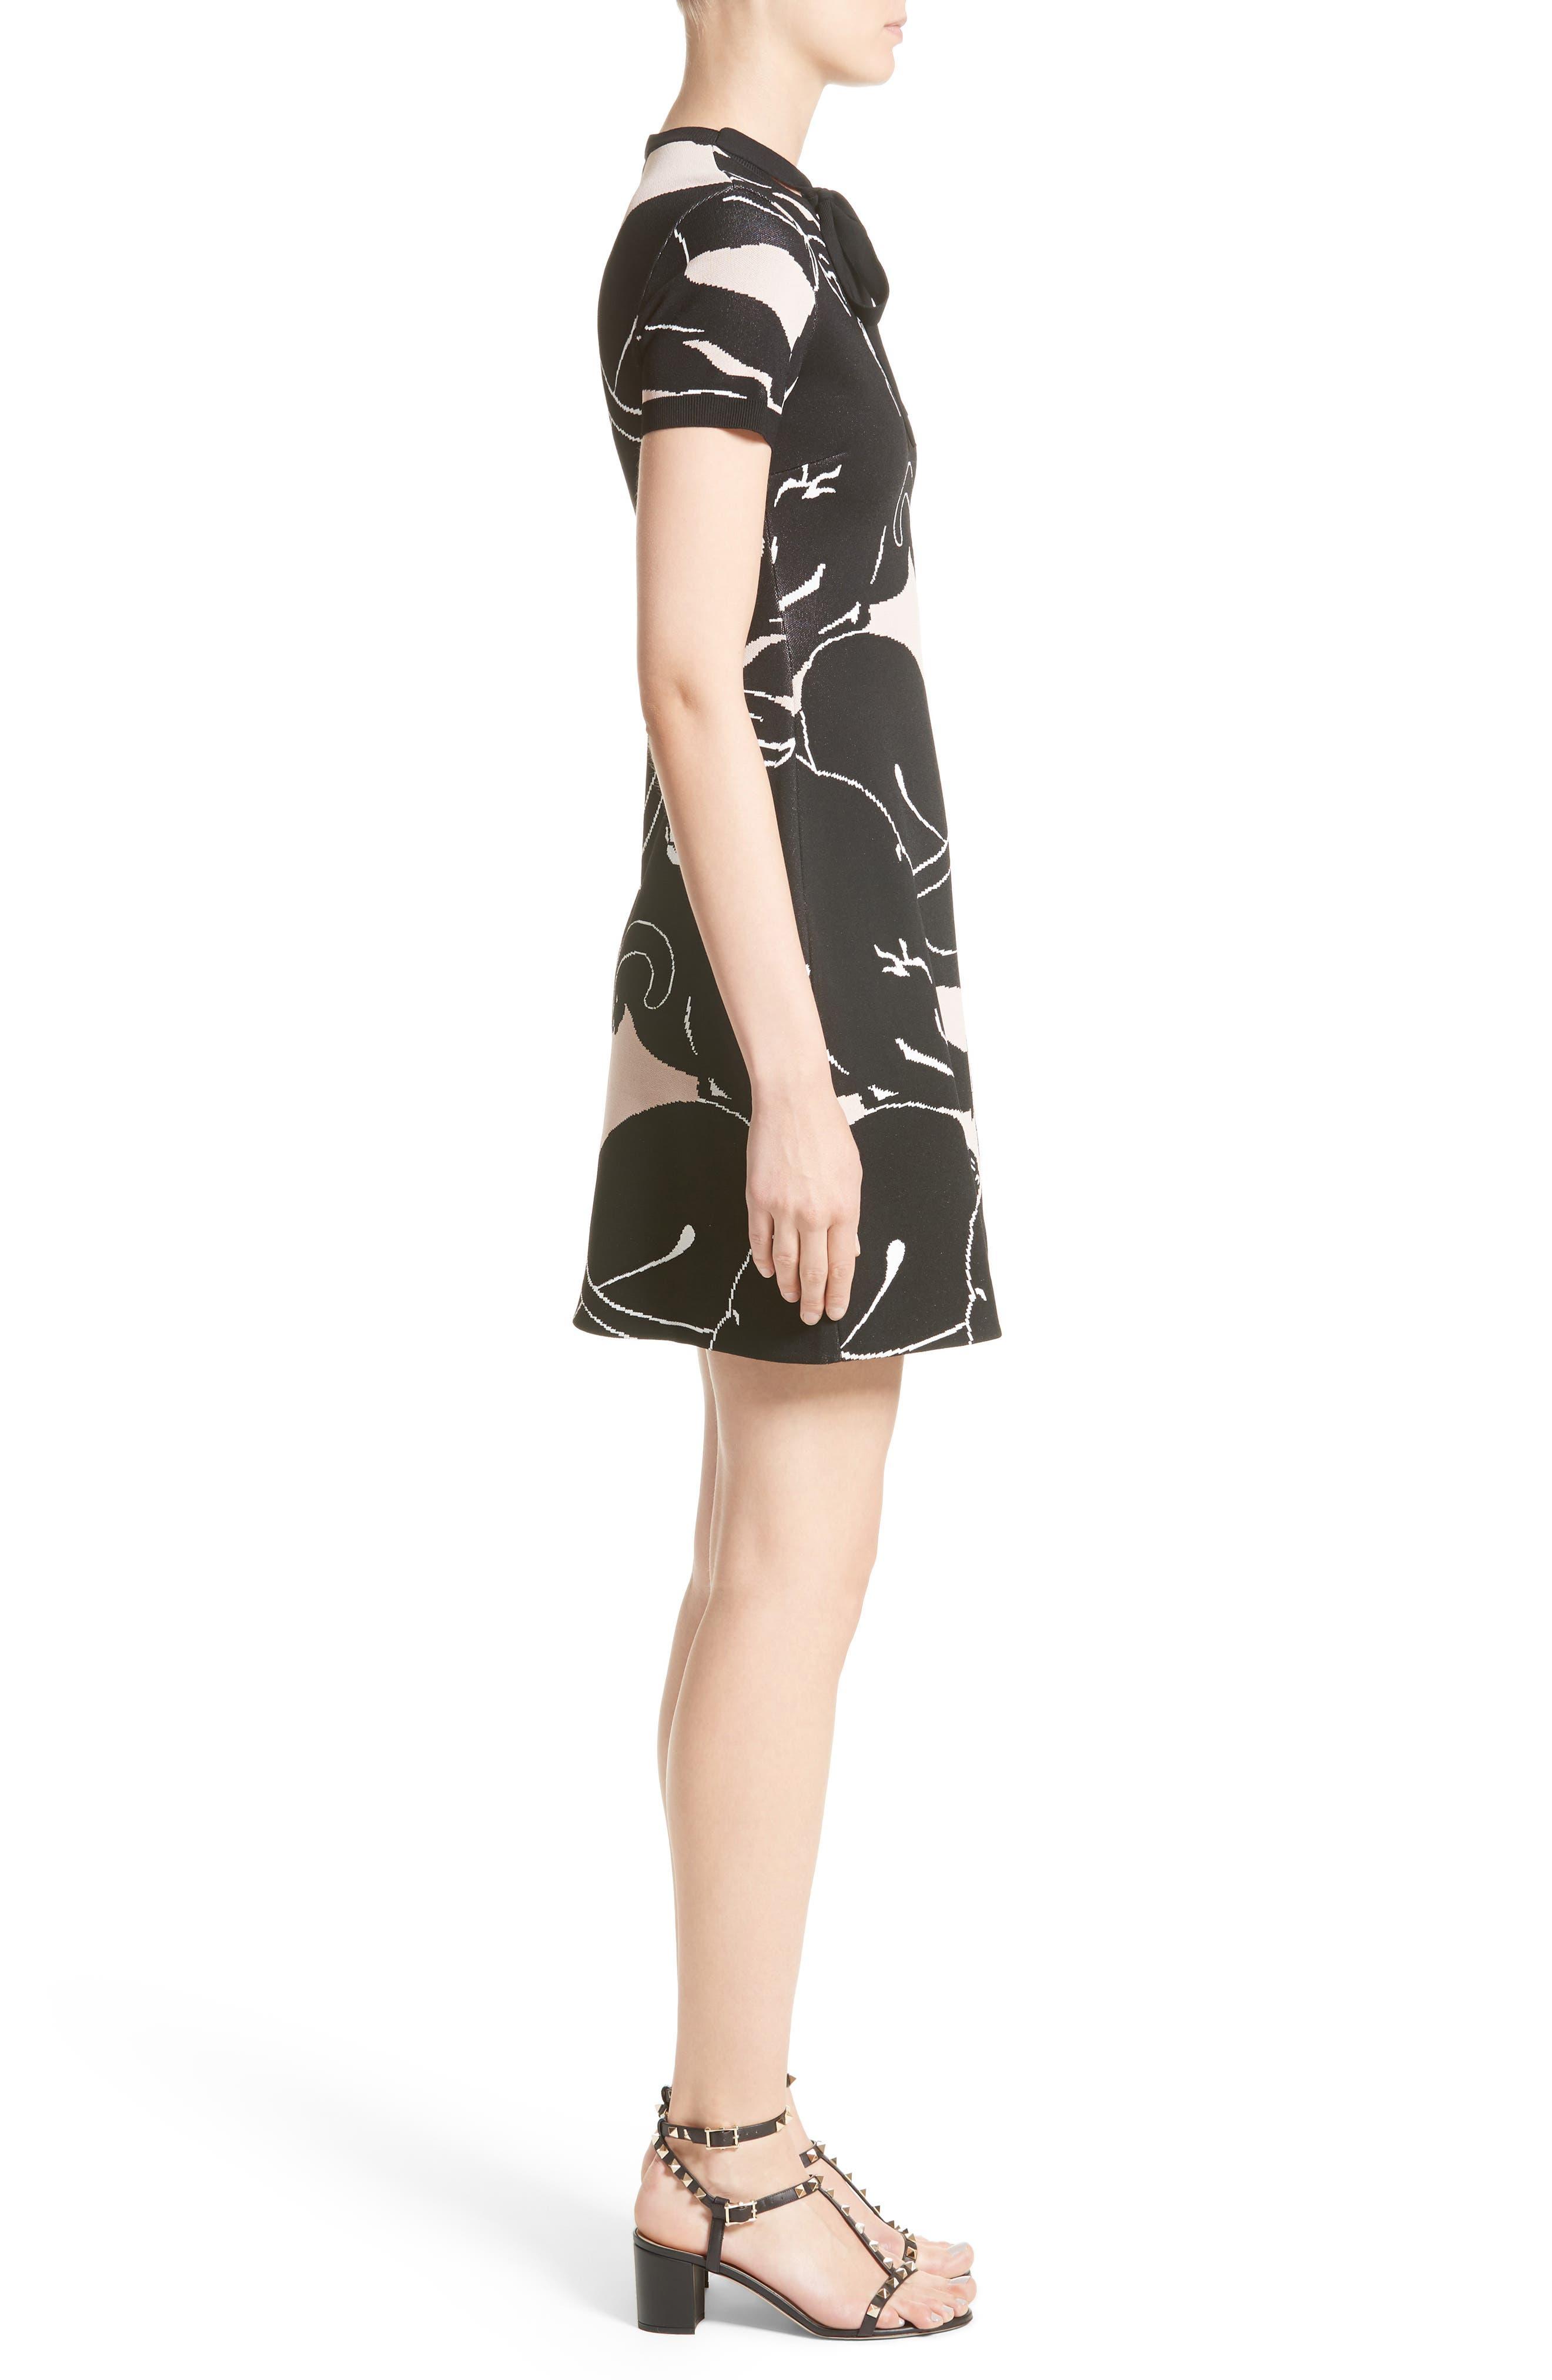 Jacquard Panther Print Dress,                             Alternate thumbnail 3, color,                             001